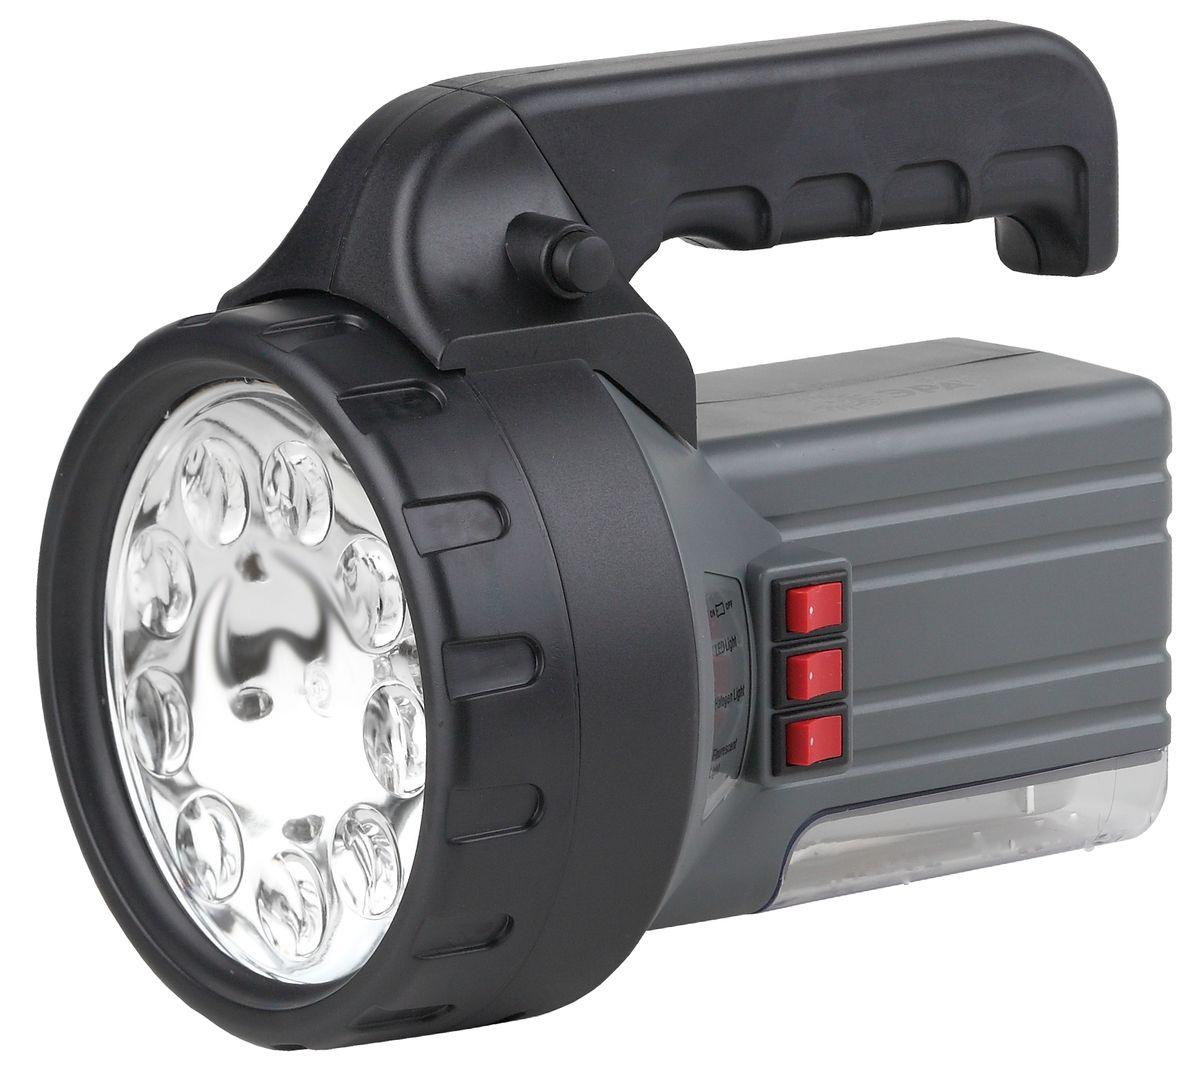 Фонарь ручной ЭРА, 9xLED, галоген 10W, люм 7W, аккумулятор 6V2.5Ah, ЗУ 220VFA55MАккумуляторный светодиодный прожектор: 9 белых LED + галогенная лампа 10W + люмлампа 7W Аккумулятор 6V 2.5Ah подзарядка от сети 220V